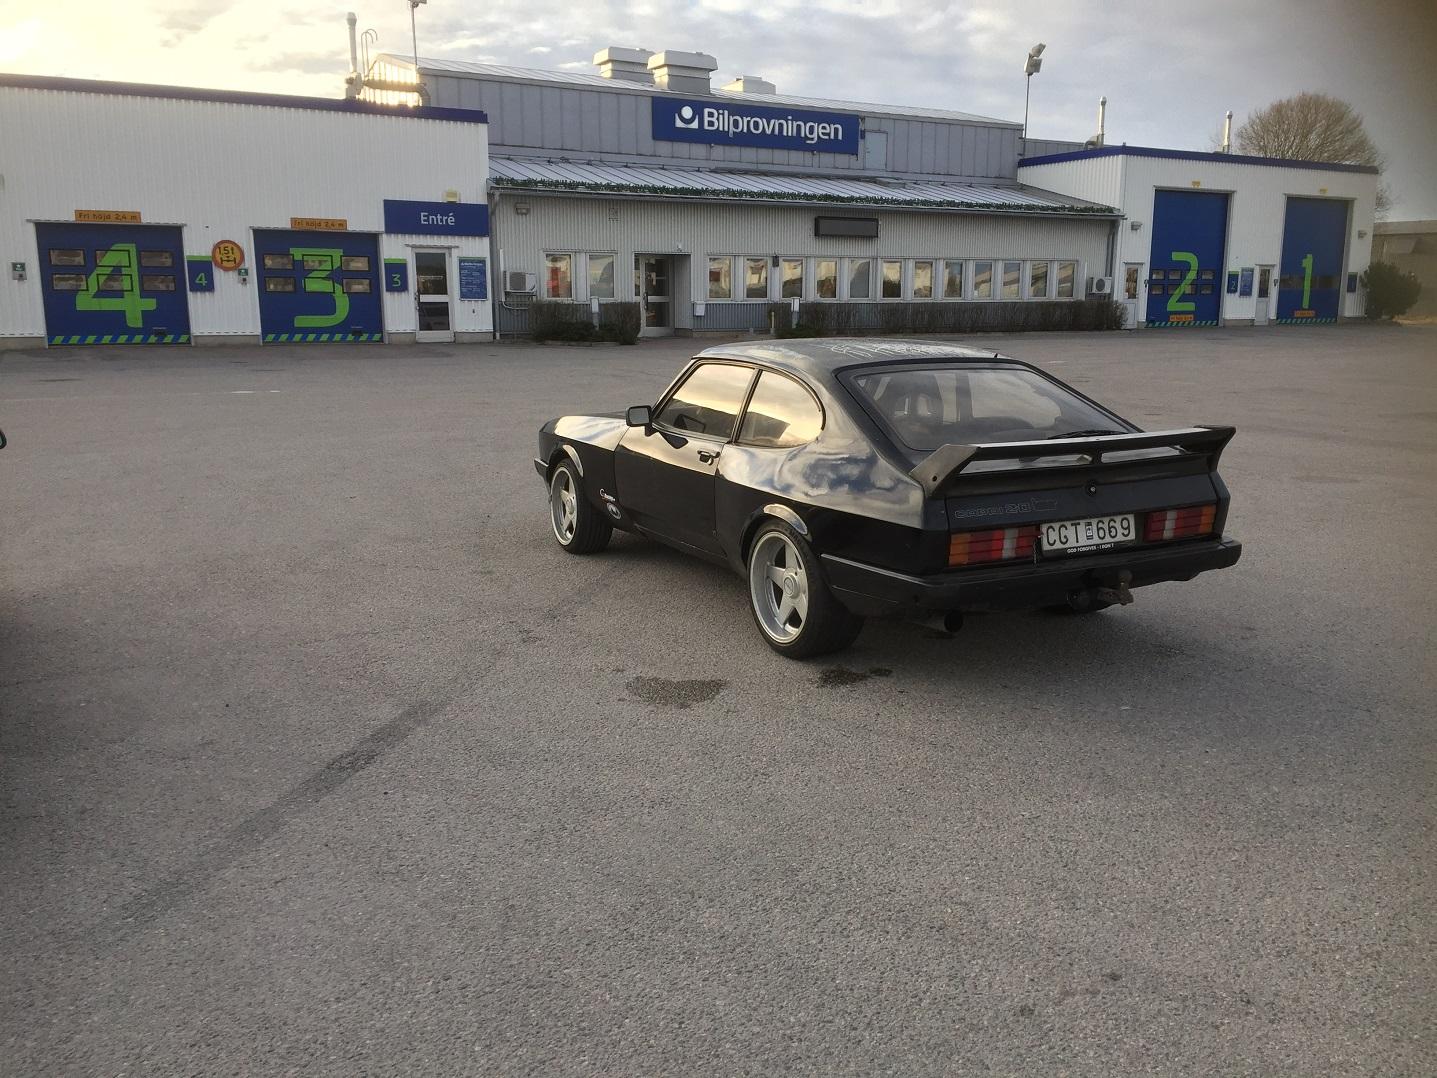 Håcke - Ford Capri Turbo Bromsad 502,2whp 669,9wnm - Sida 17 2i6zxv6